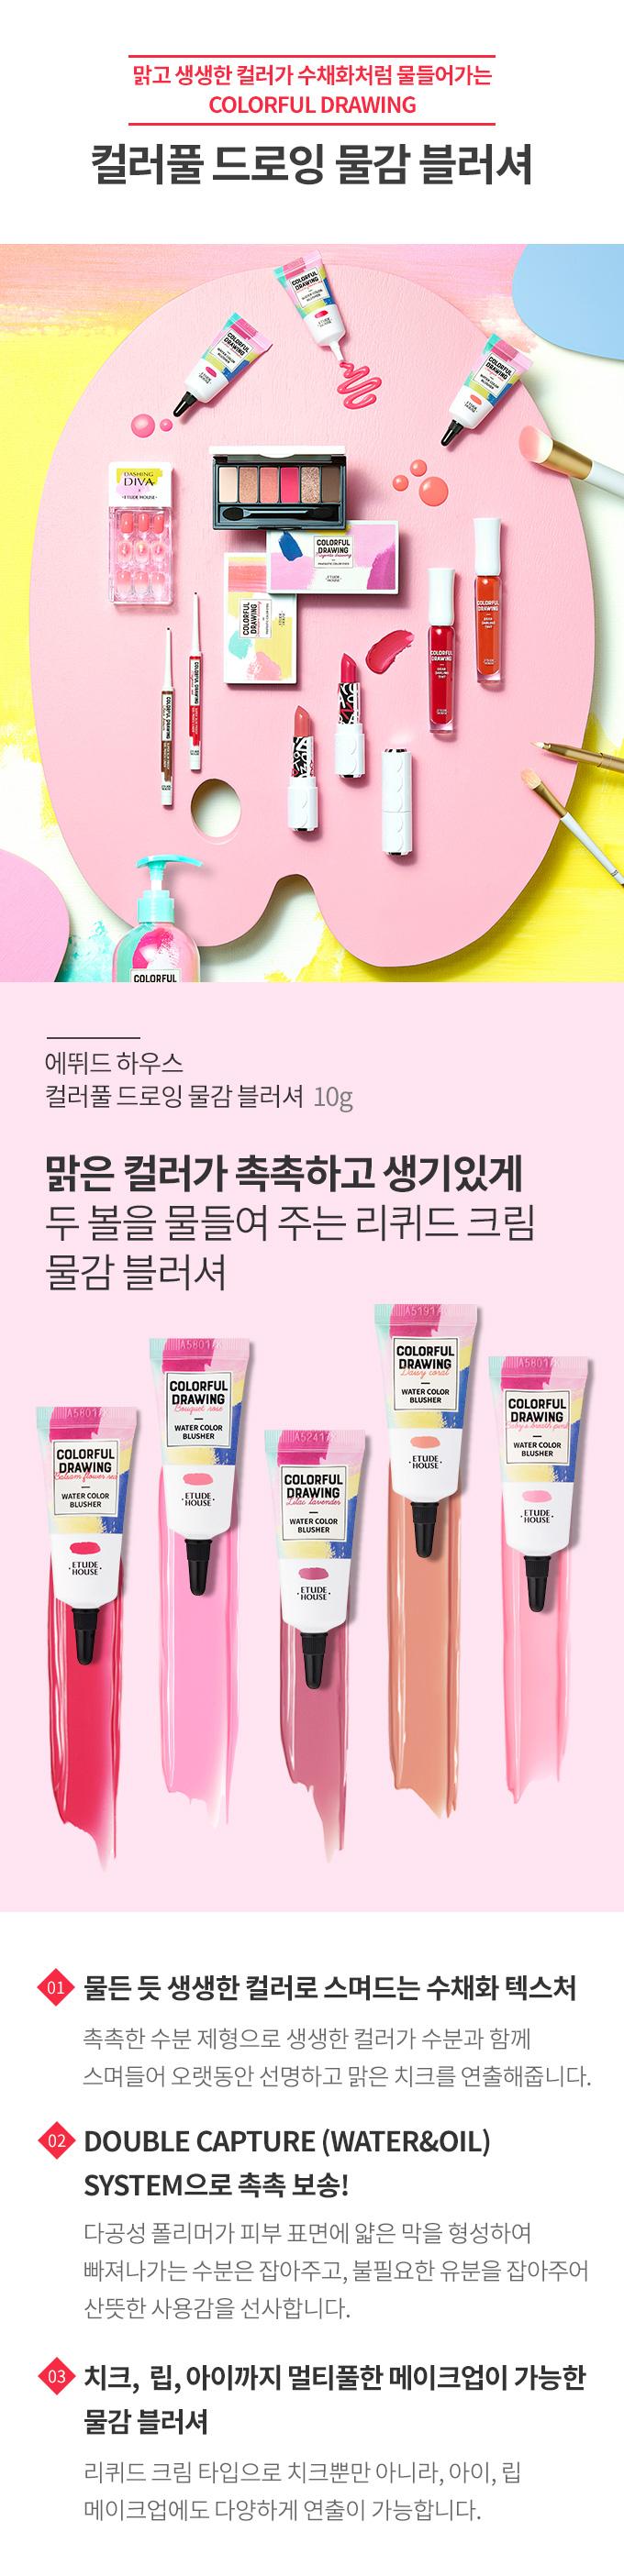 ETUDE HOUSE] Colorful drawing paint blusher / Korean Cosmetics   eBay